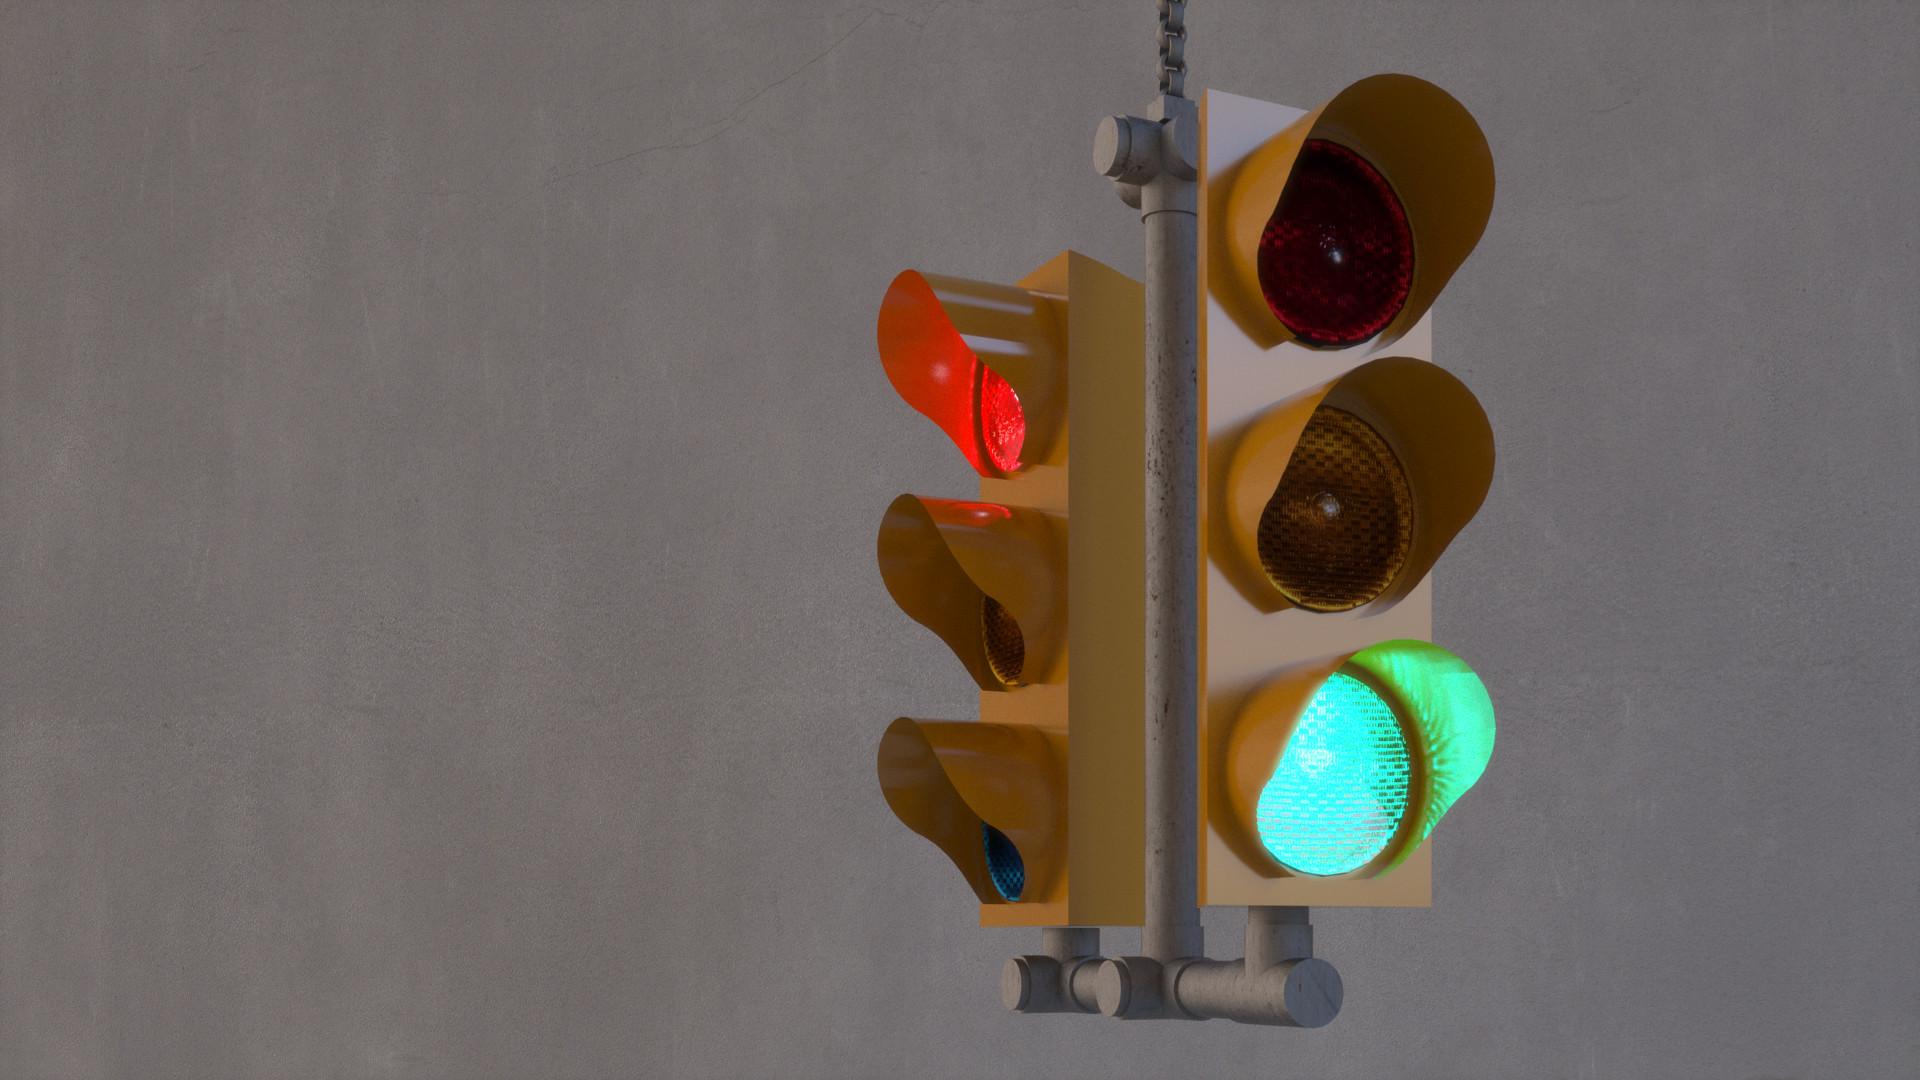 Duane kemp proposed kitchen signal light 01